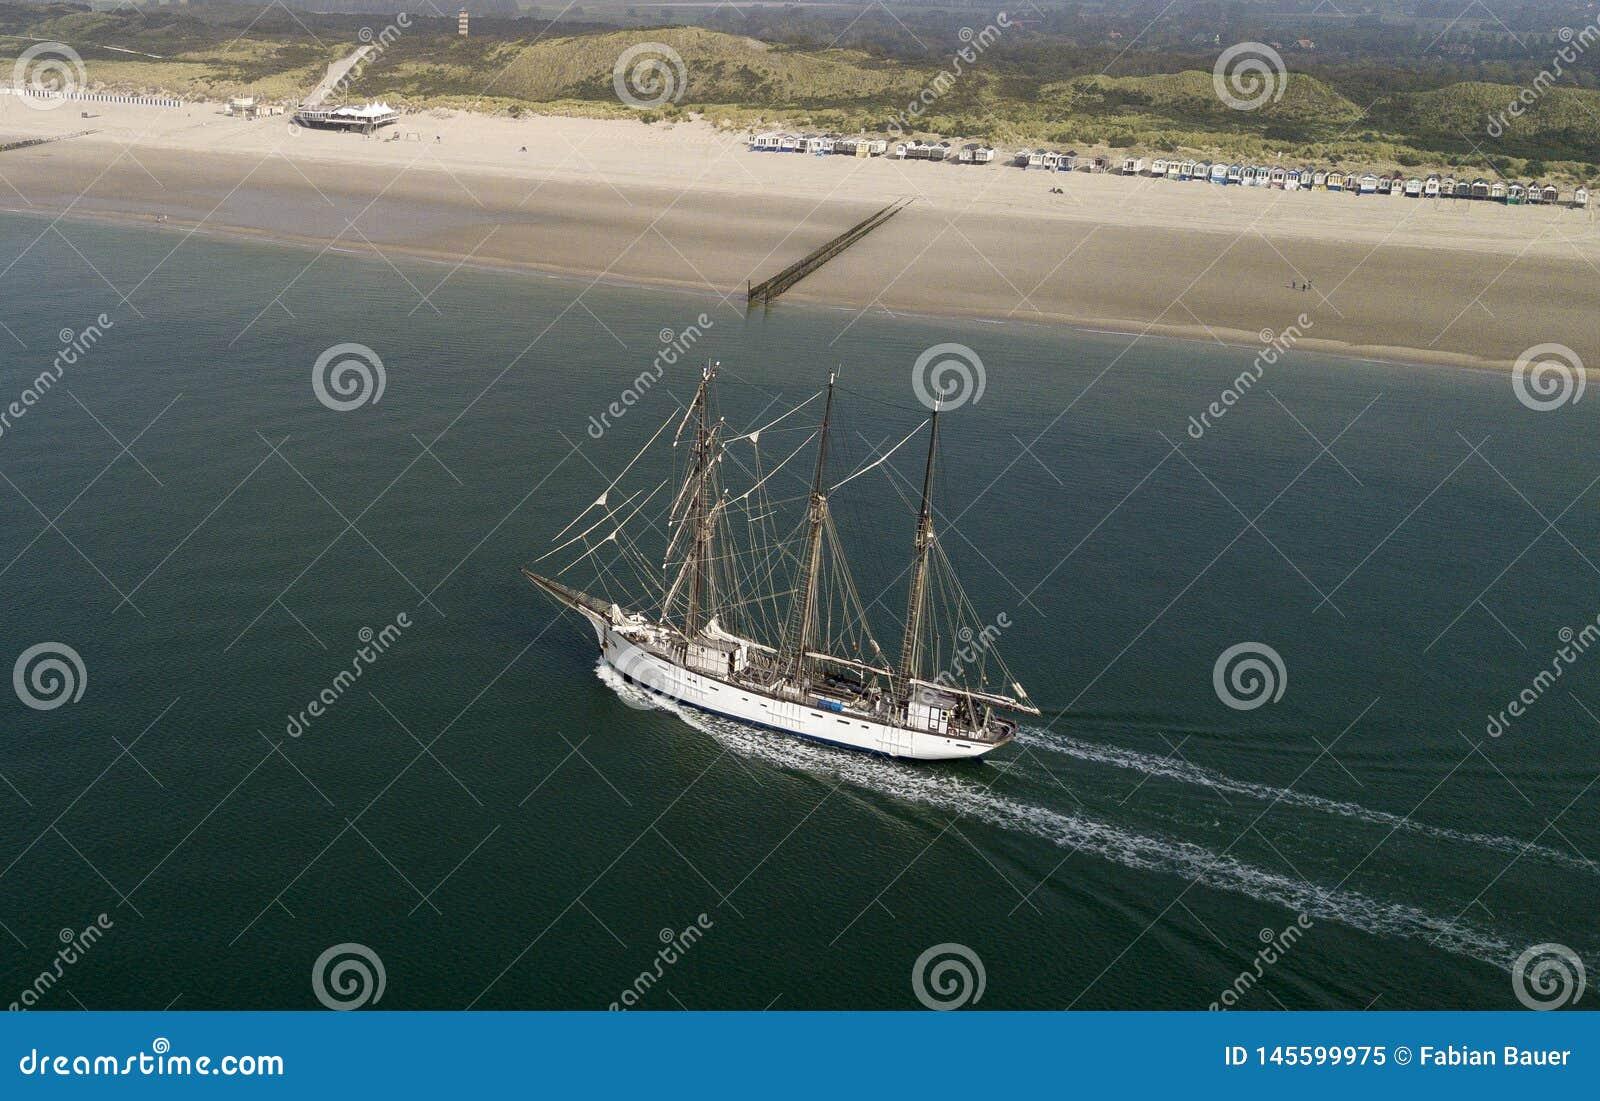 Sailboat στη θάλασσα μπροστά από την παραλία